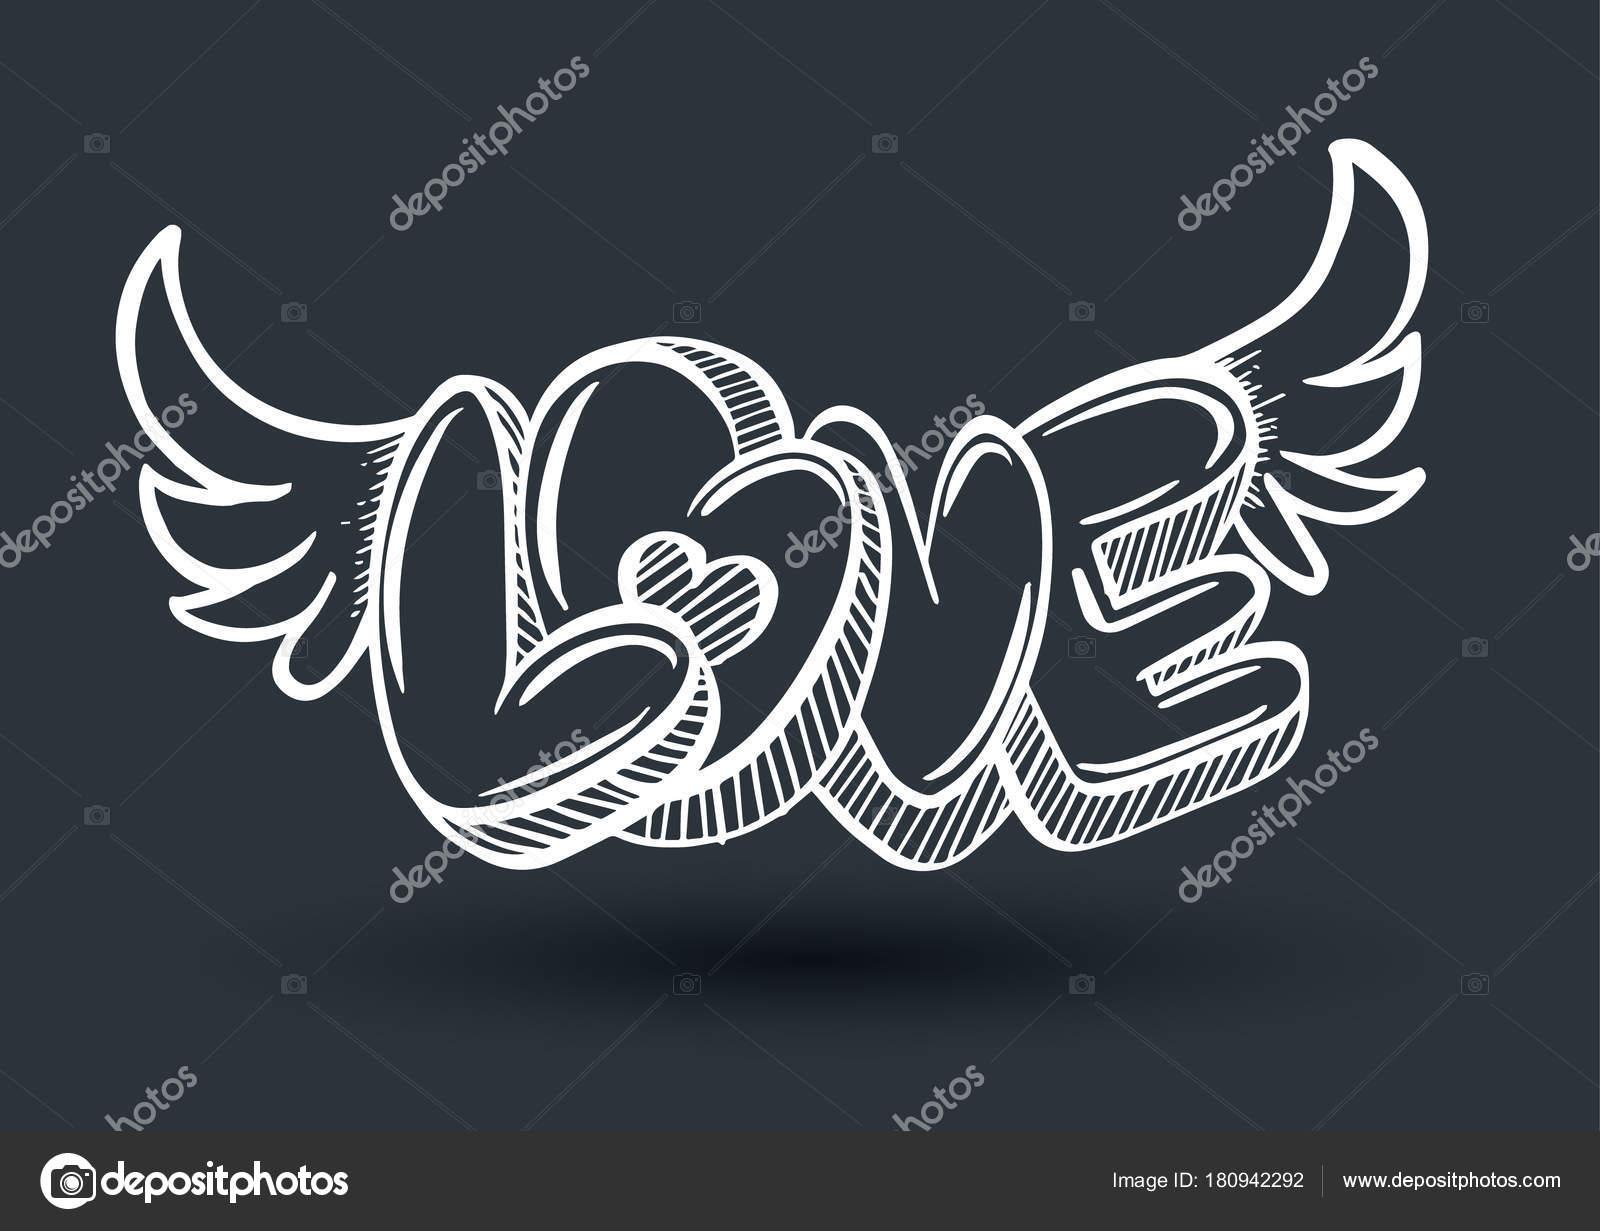 Dibujos Love En 3d Amo El Estilo De Dibujo 3d Vector De Stock